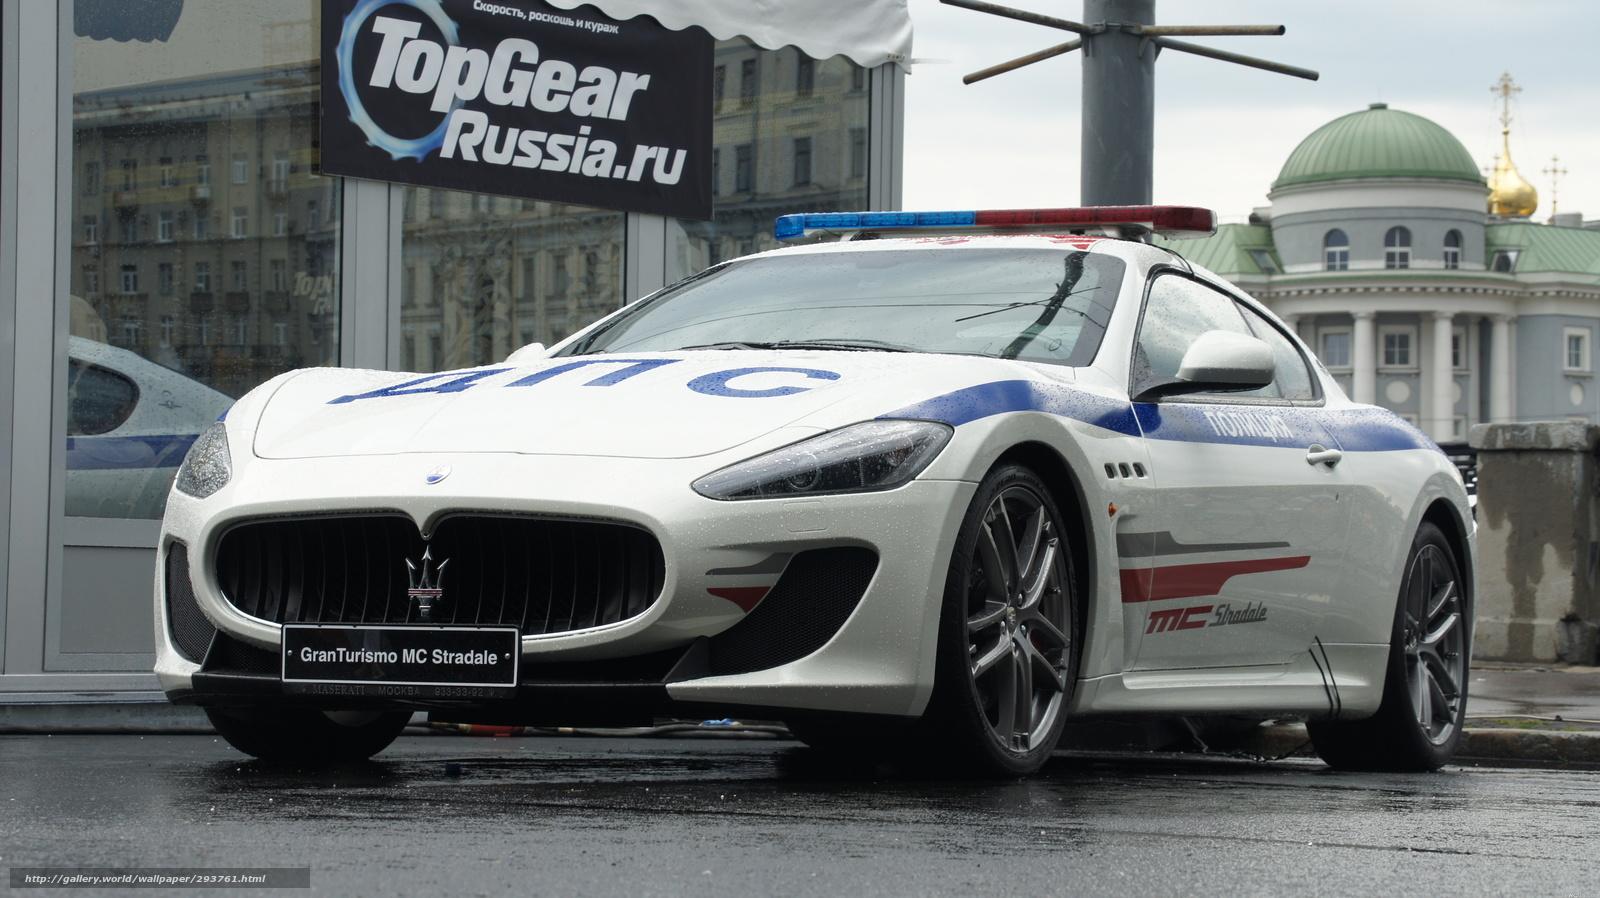 Tlcharger fond d 39 ecran maserati voiture de sport voiture for Fond ecran voiture sport